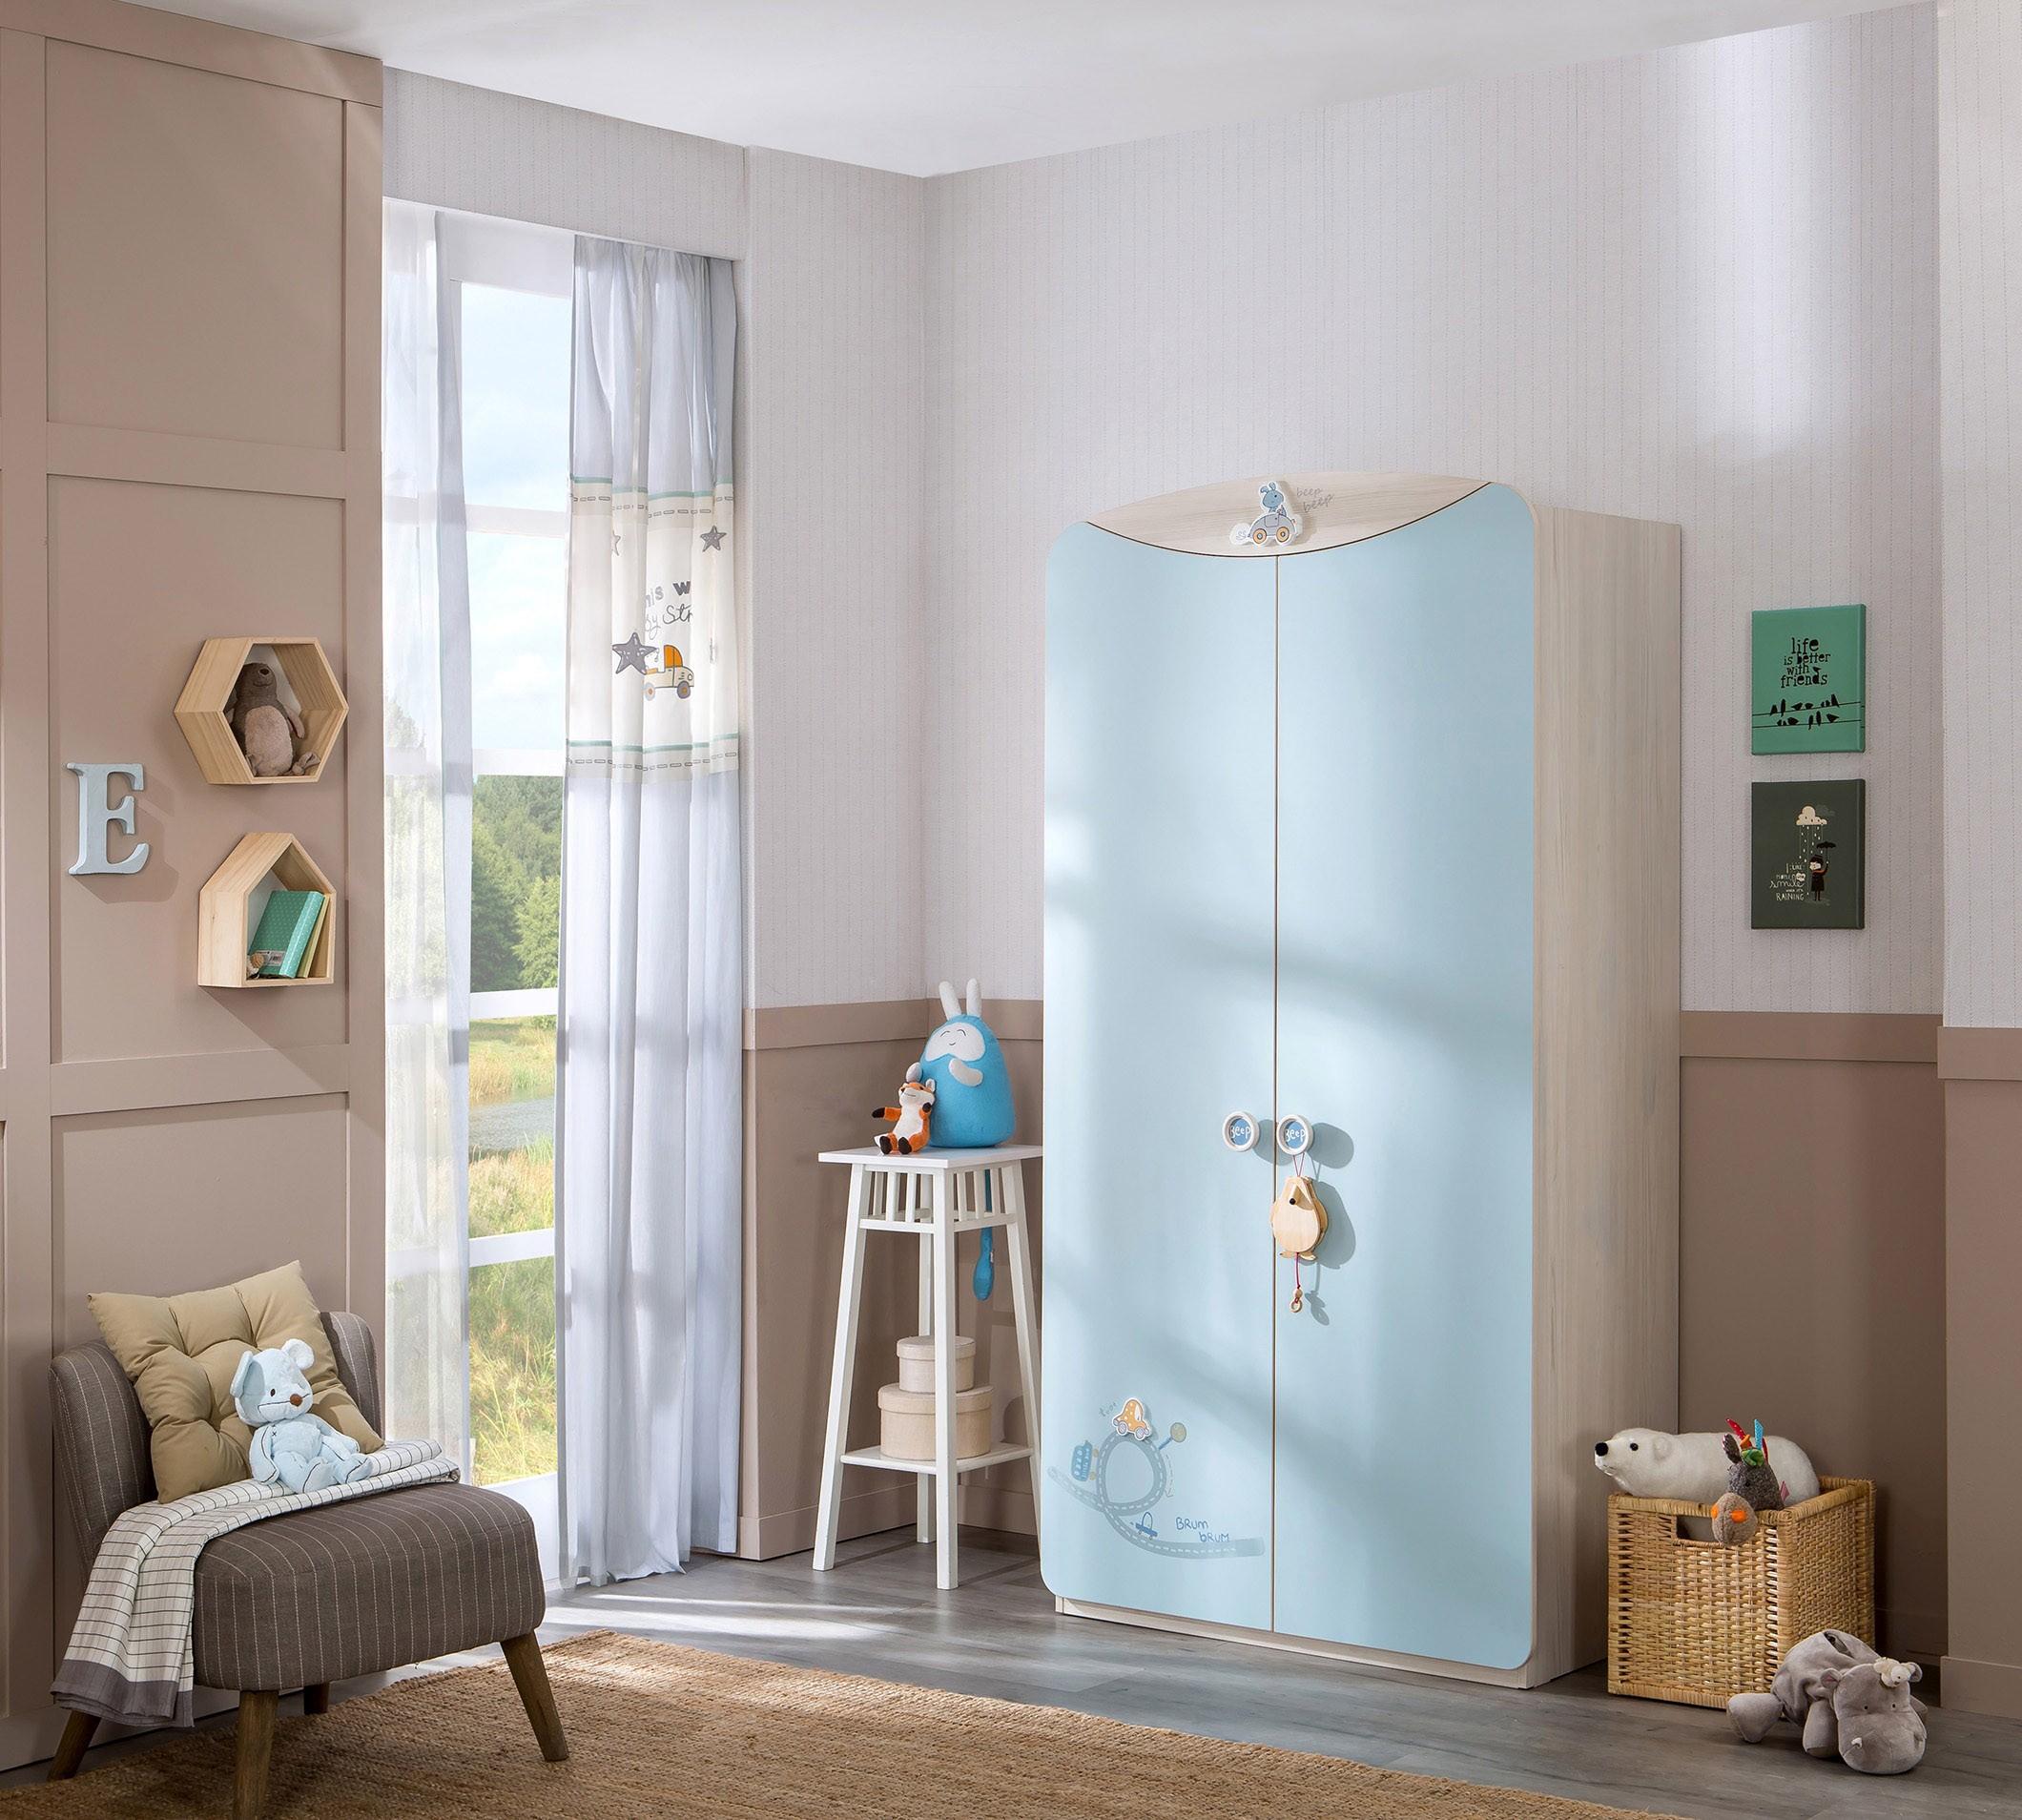 meegroeibed babykamer blauw gordijn 2 deurskast babykamer blauw